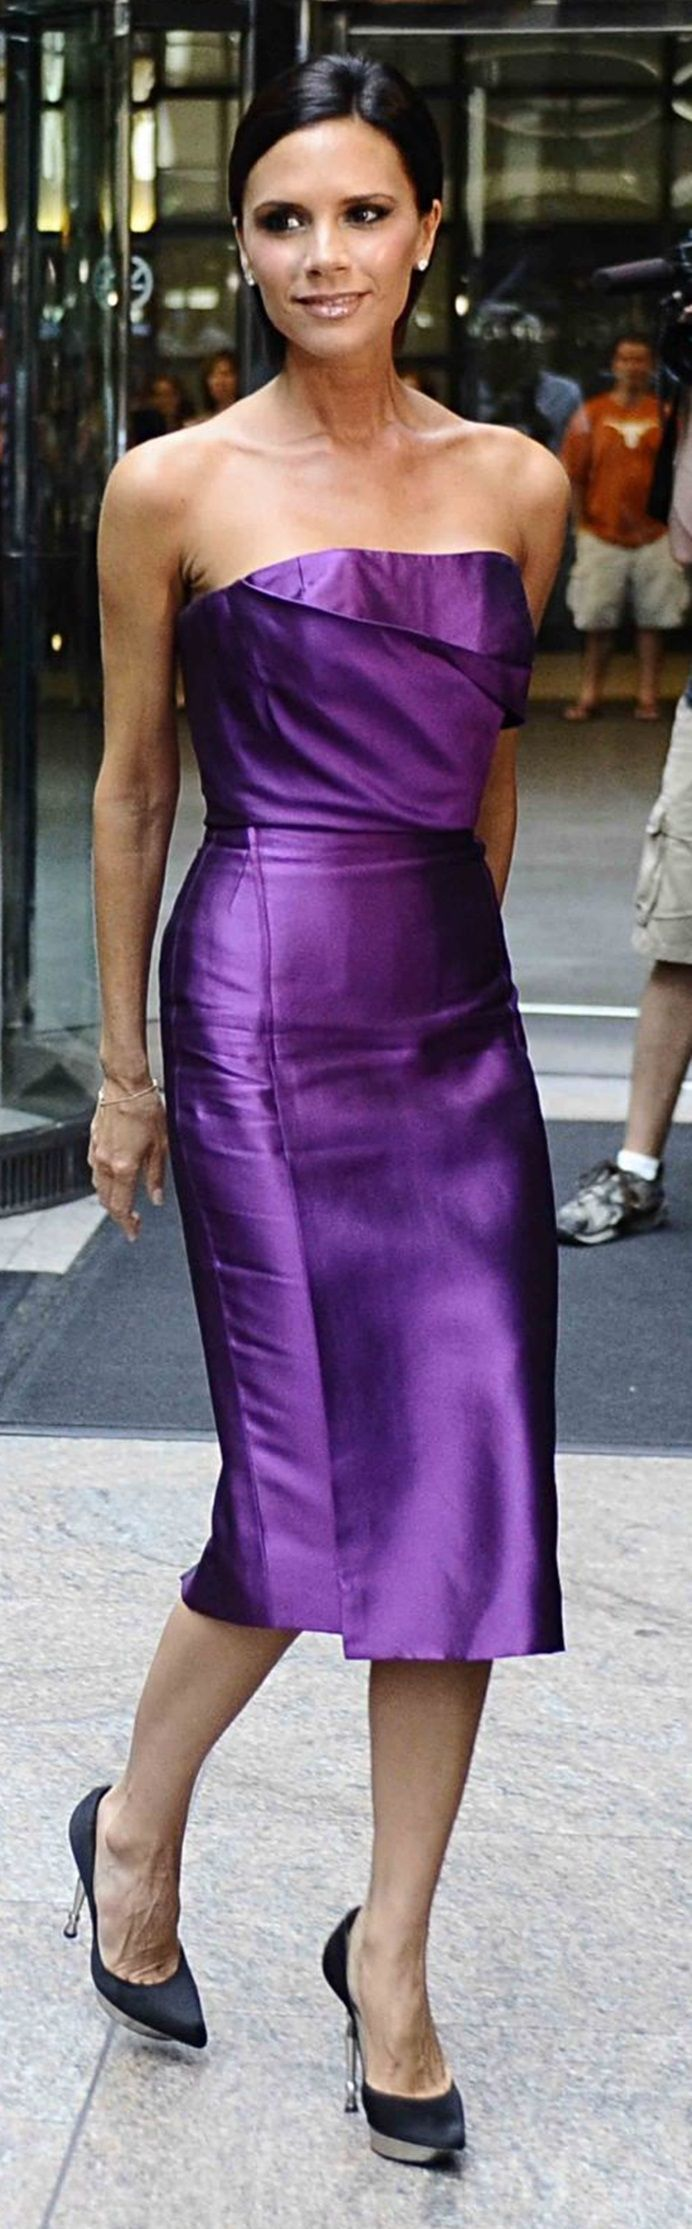 Victoria Beckham, Lilac Gorgeous!